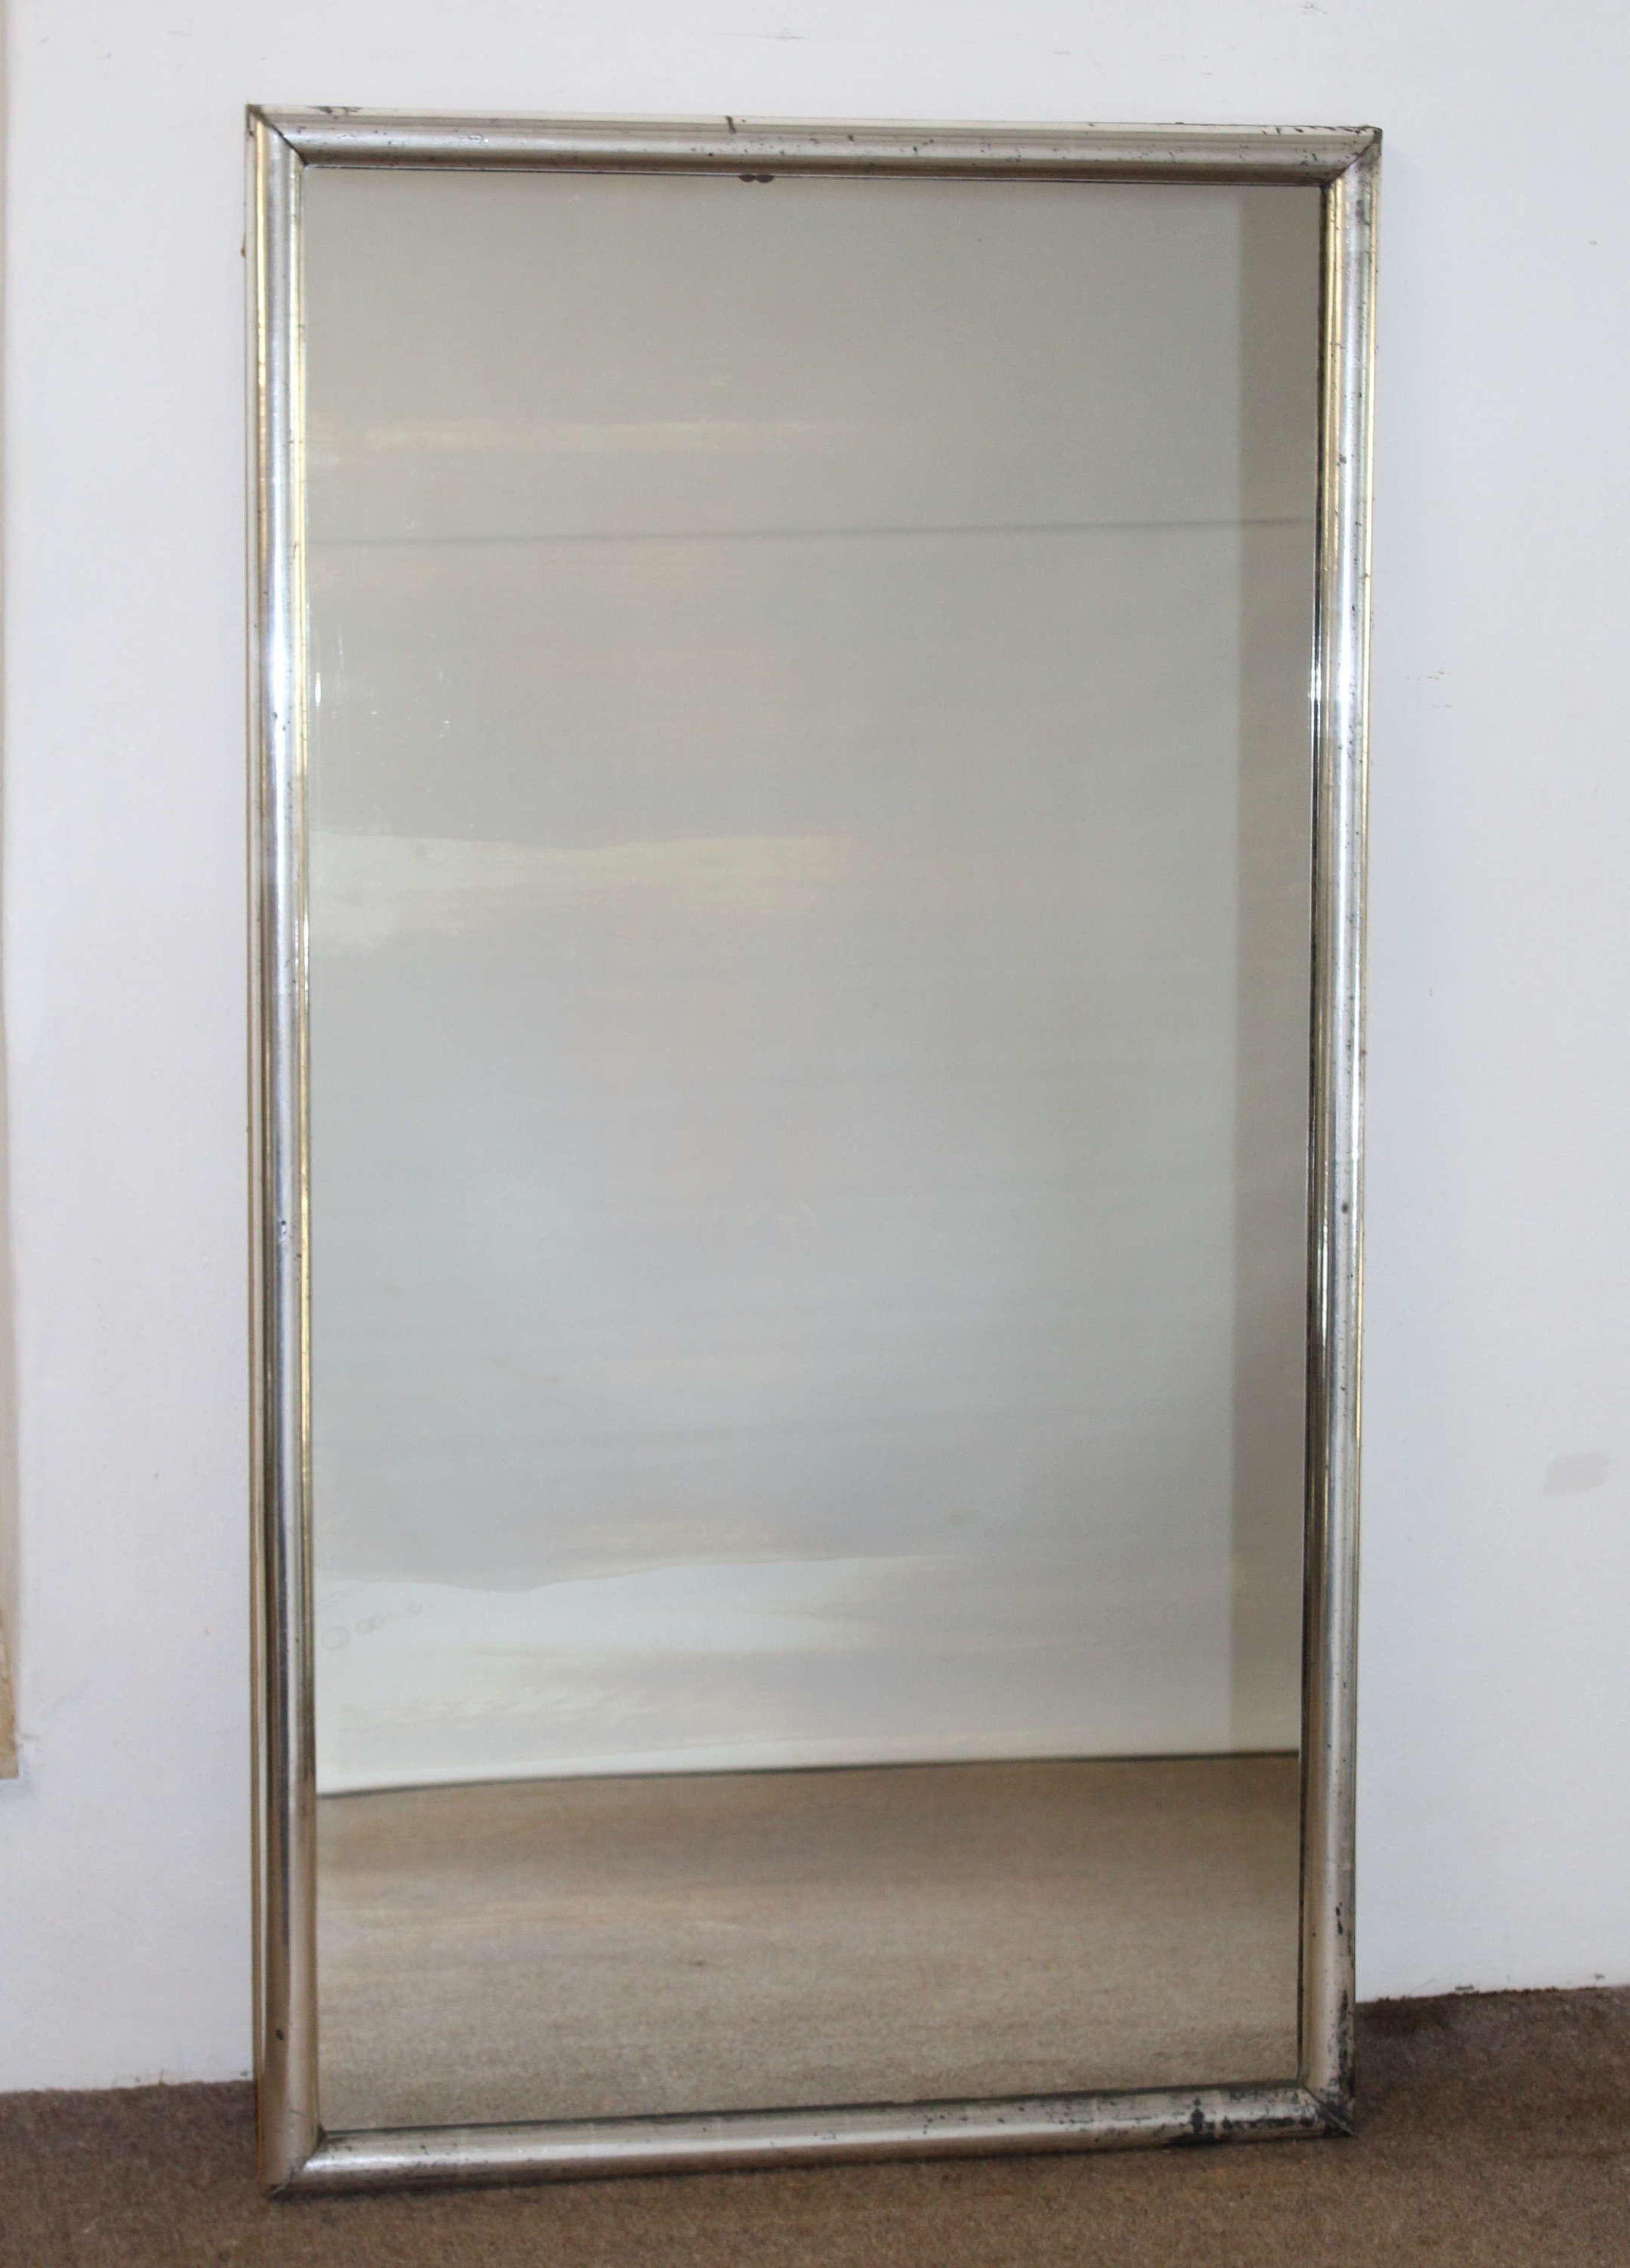 Antique French silver framed bistro mirror